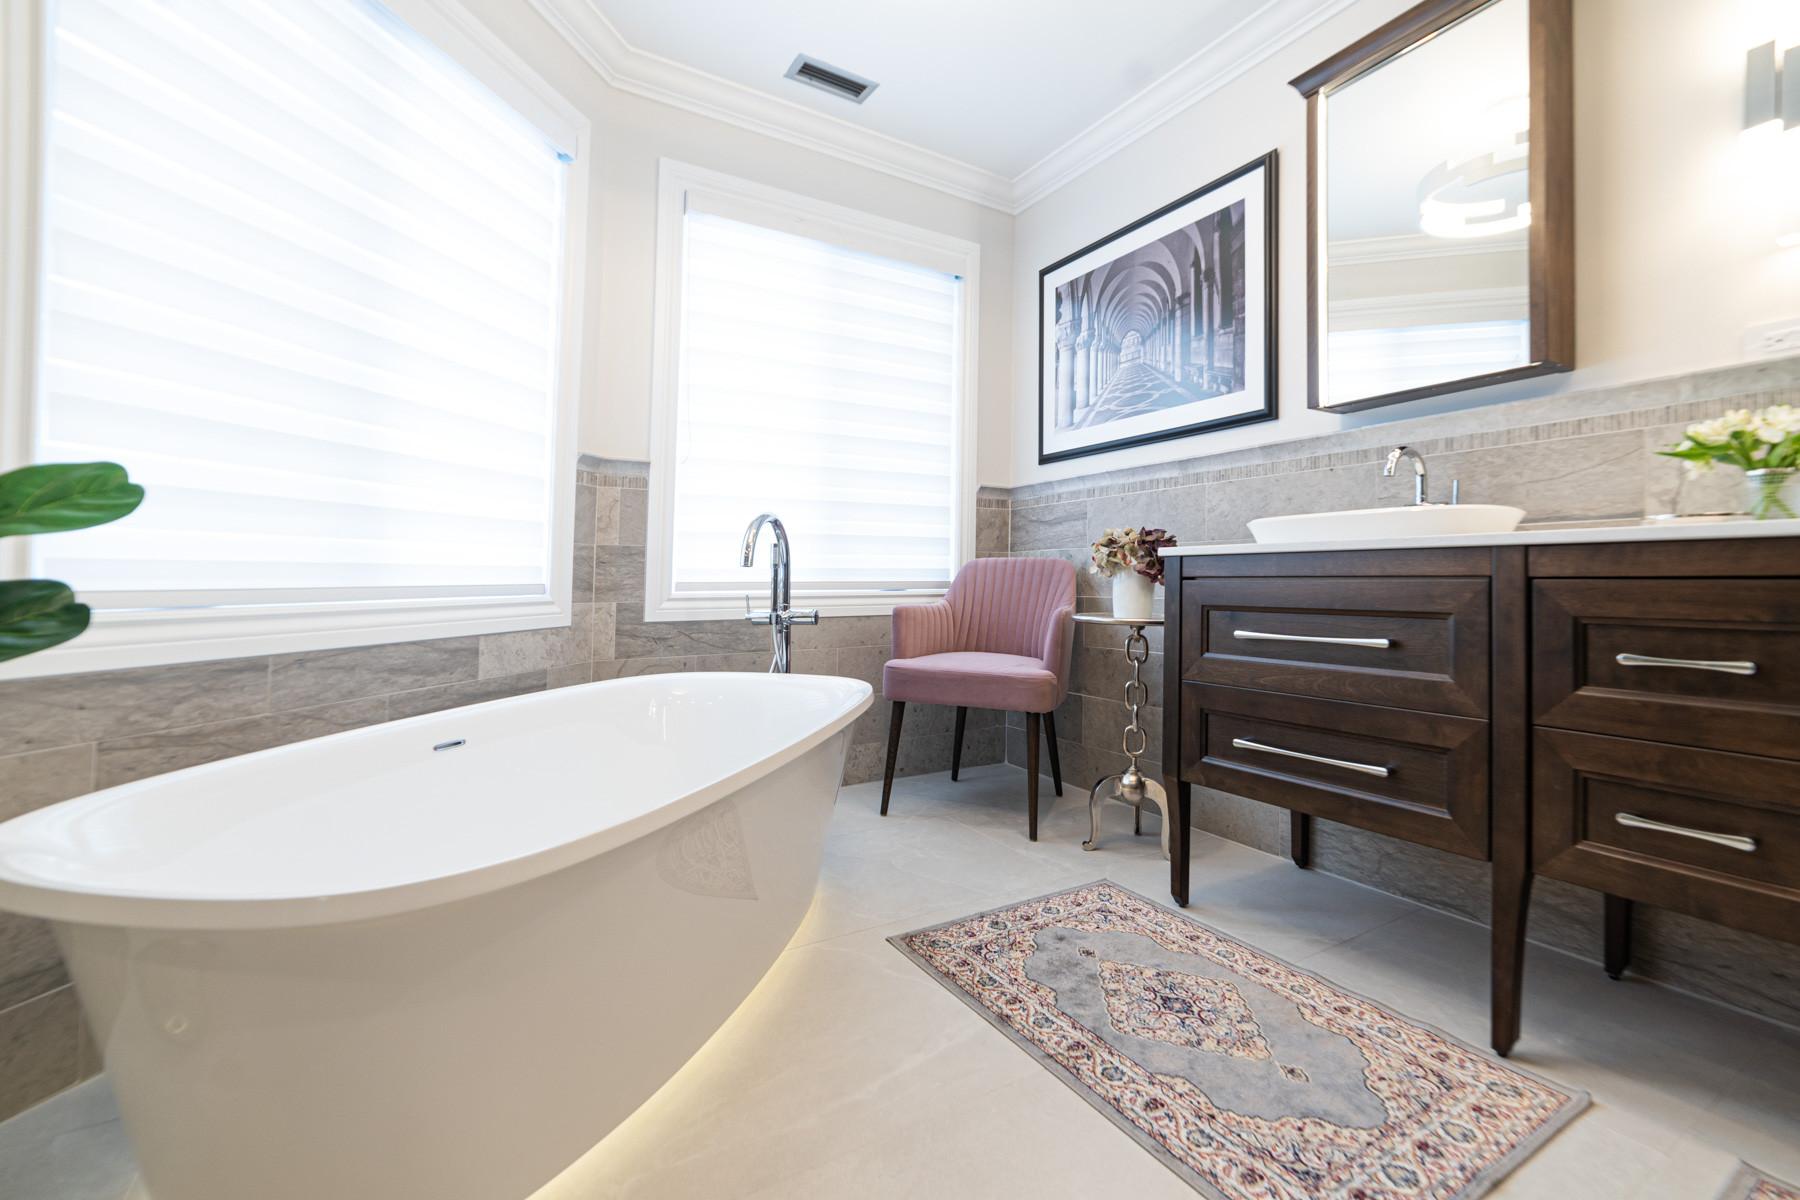 Brossard Master Bath - Full Renovation